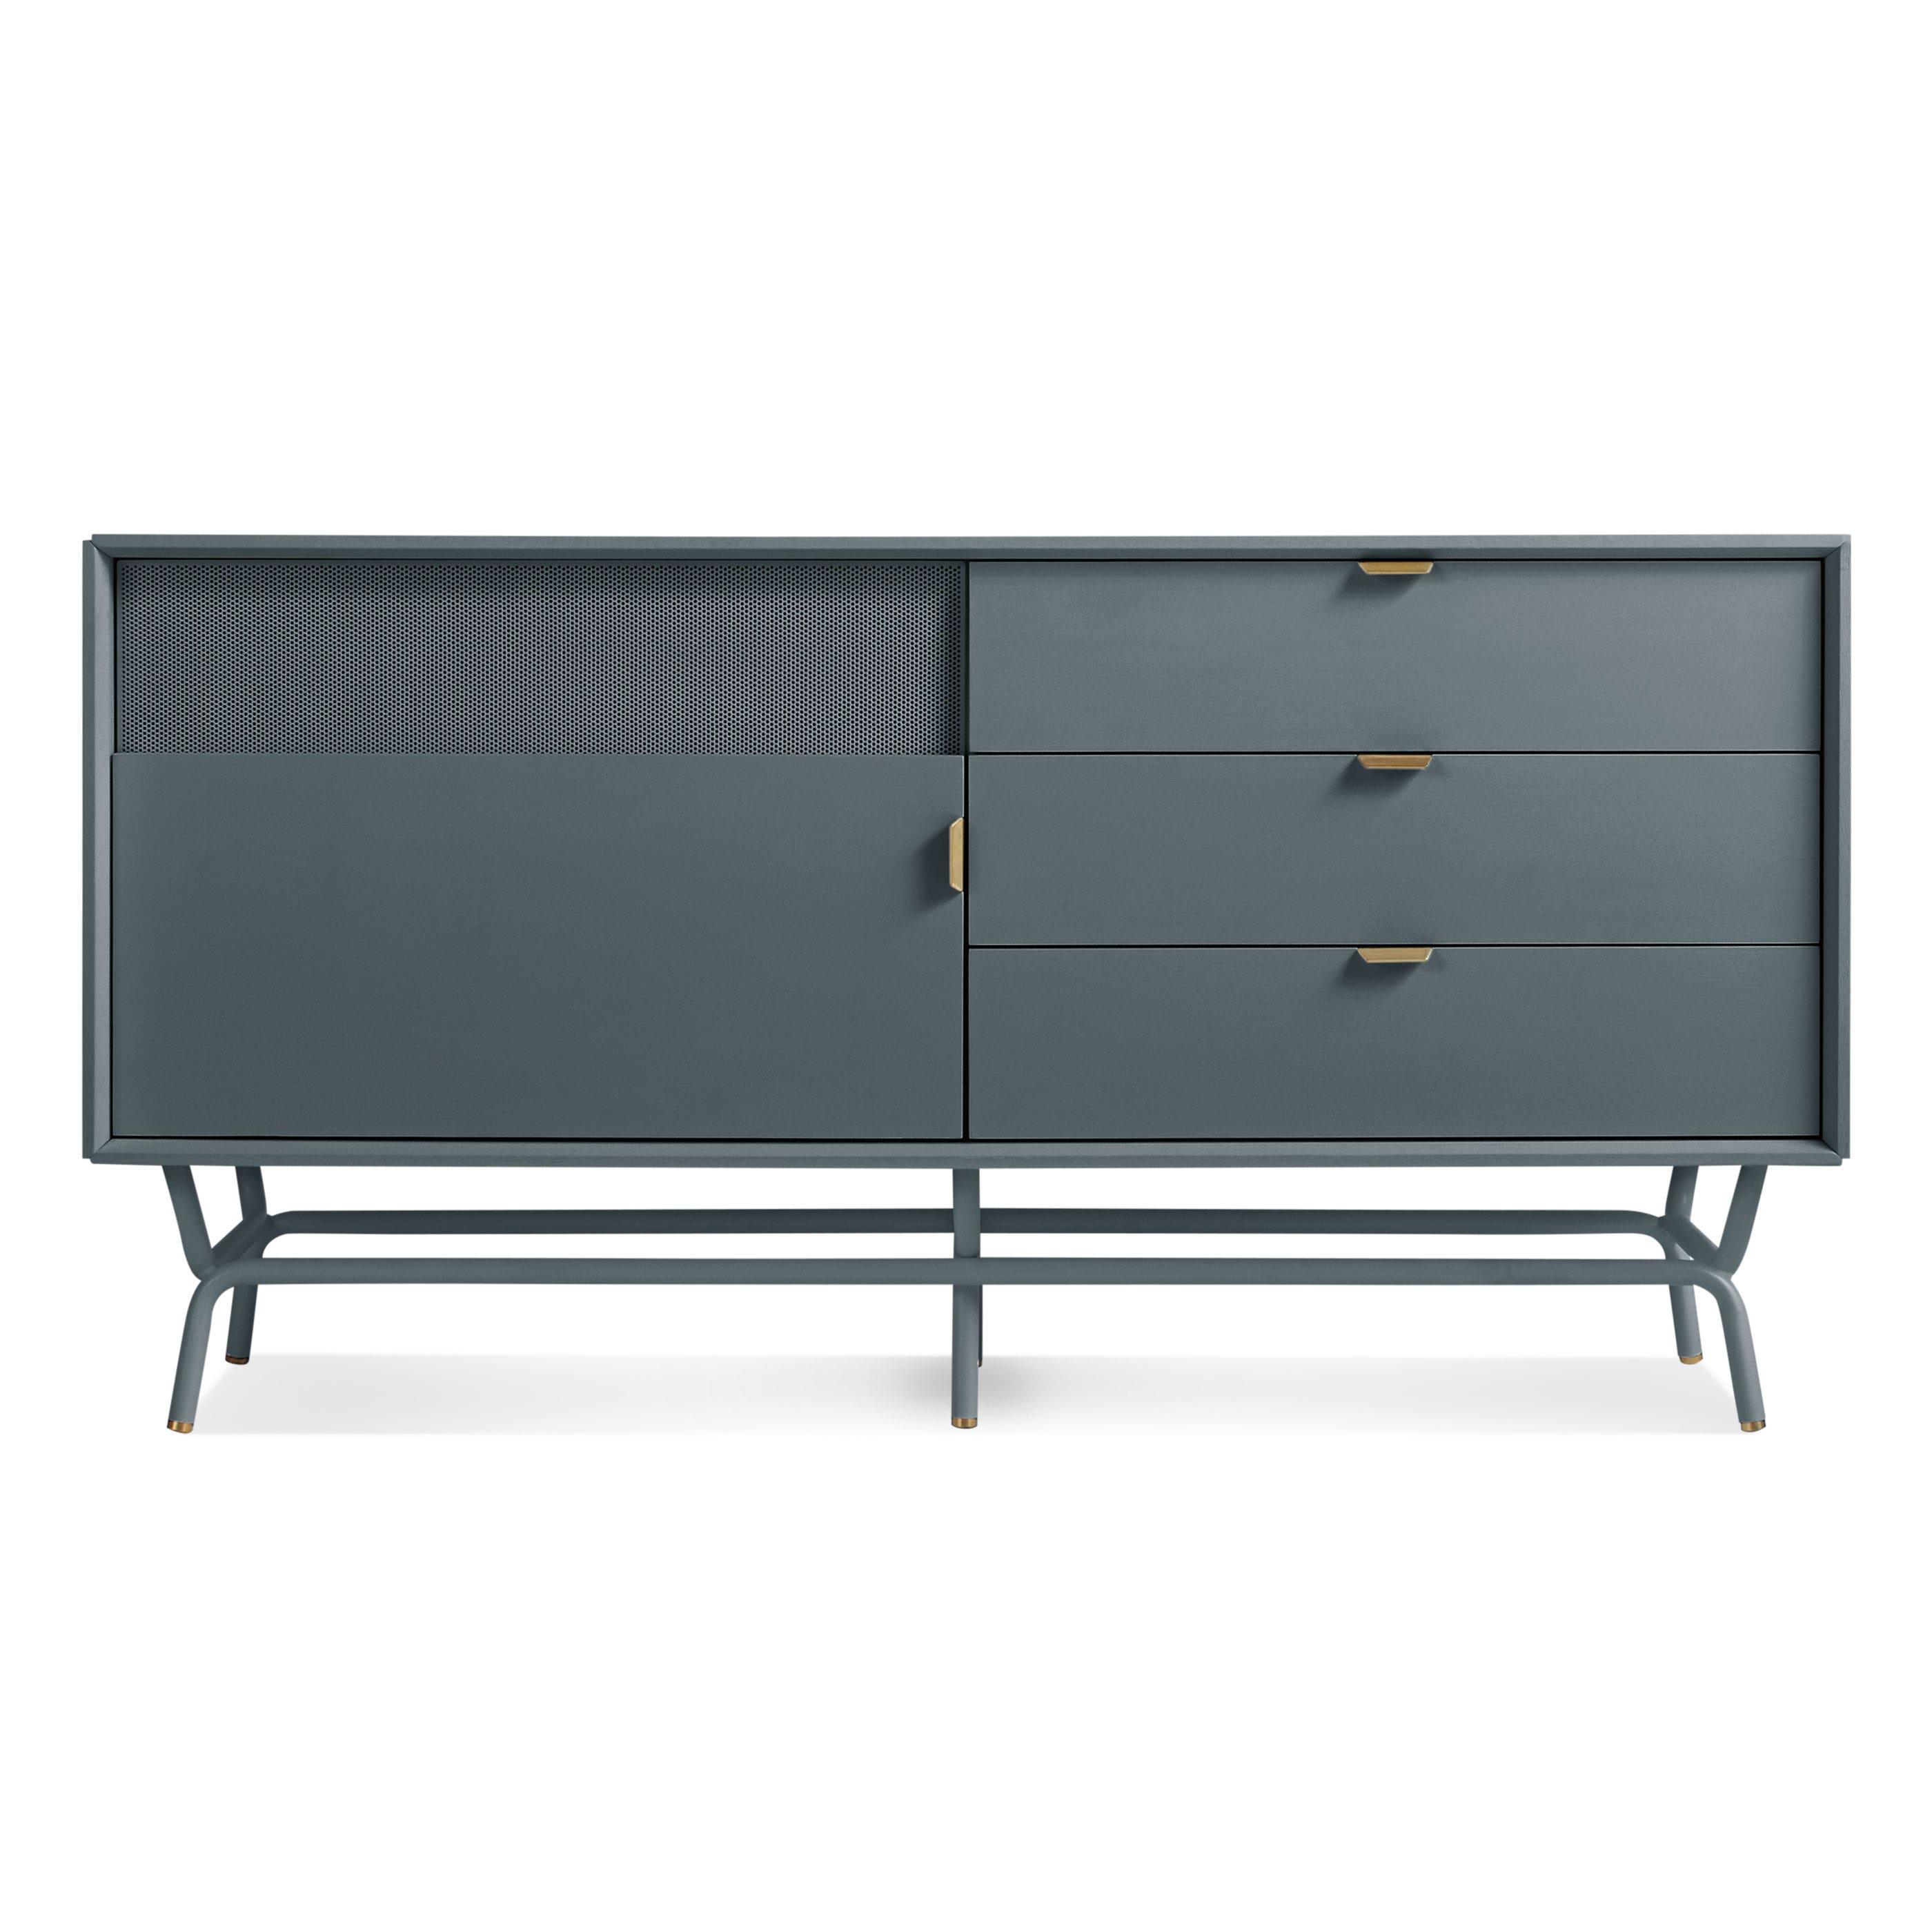 Modern Cabinets Modern Dining Room Storage Blu Dot - Dining room storage cabinets